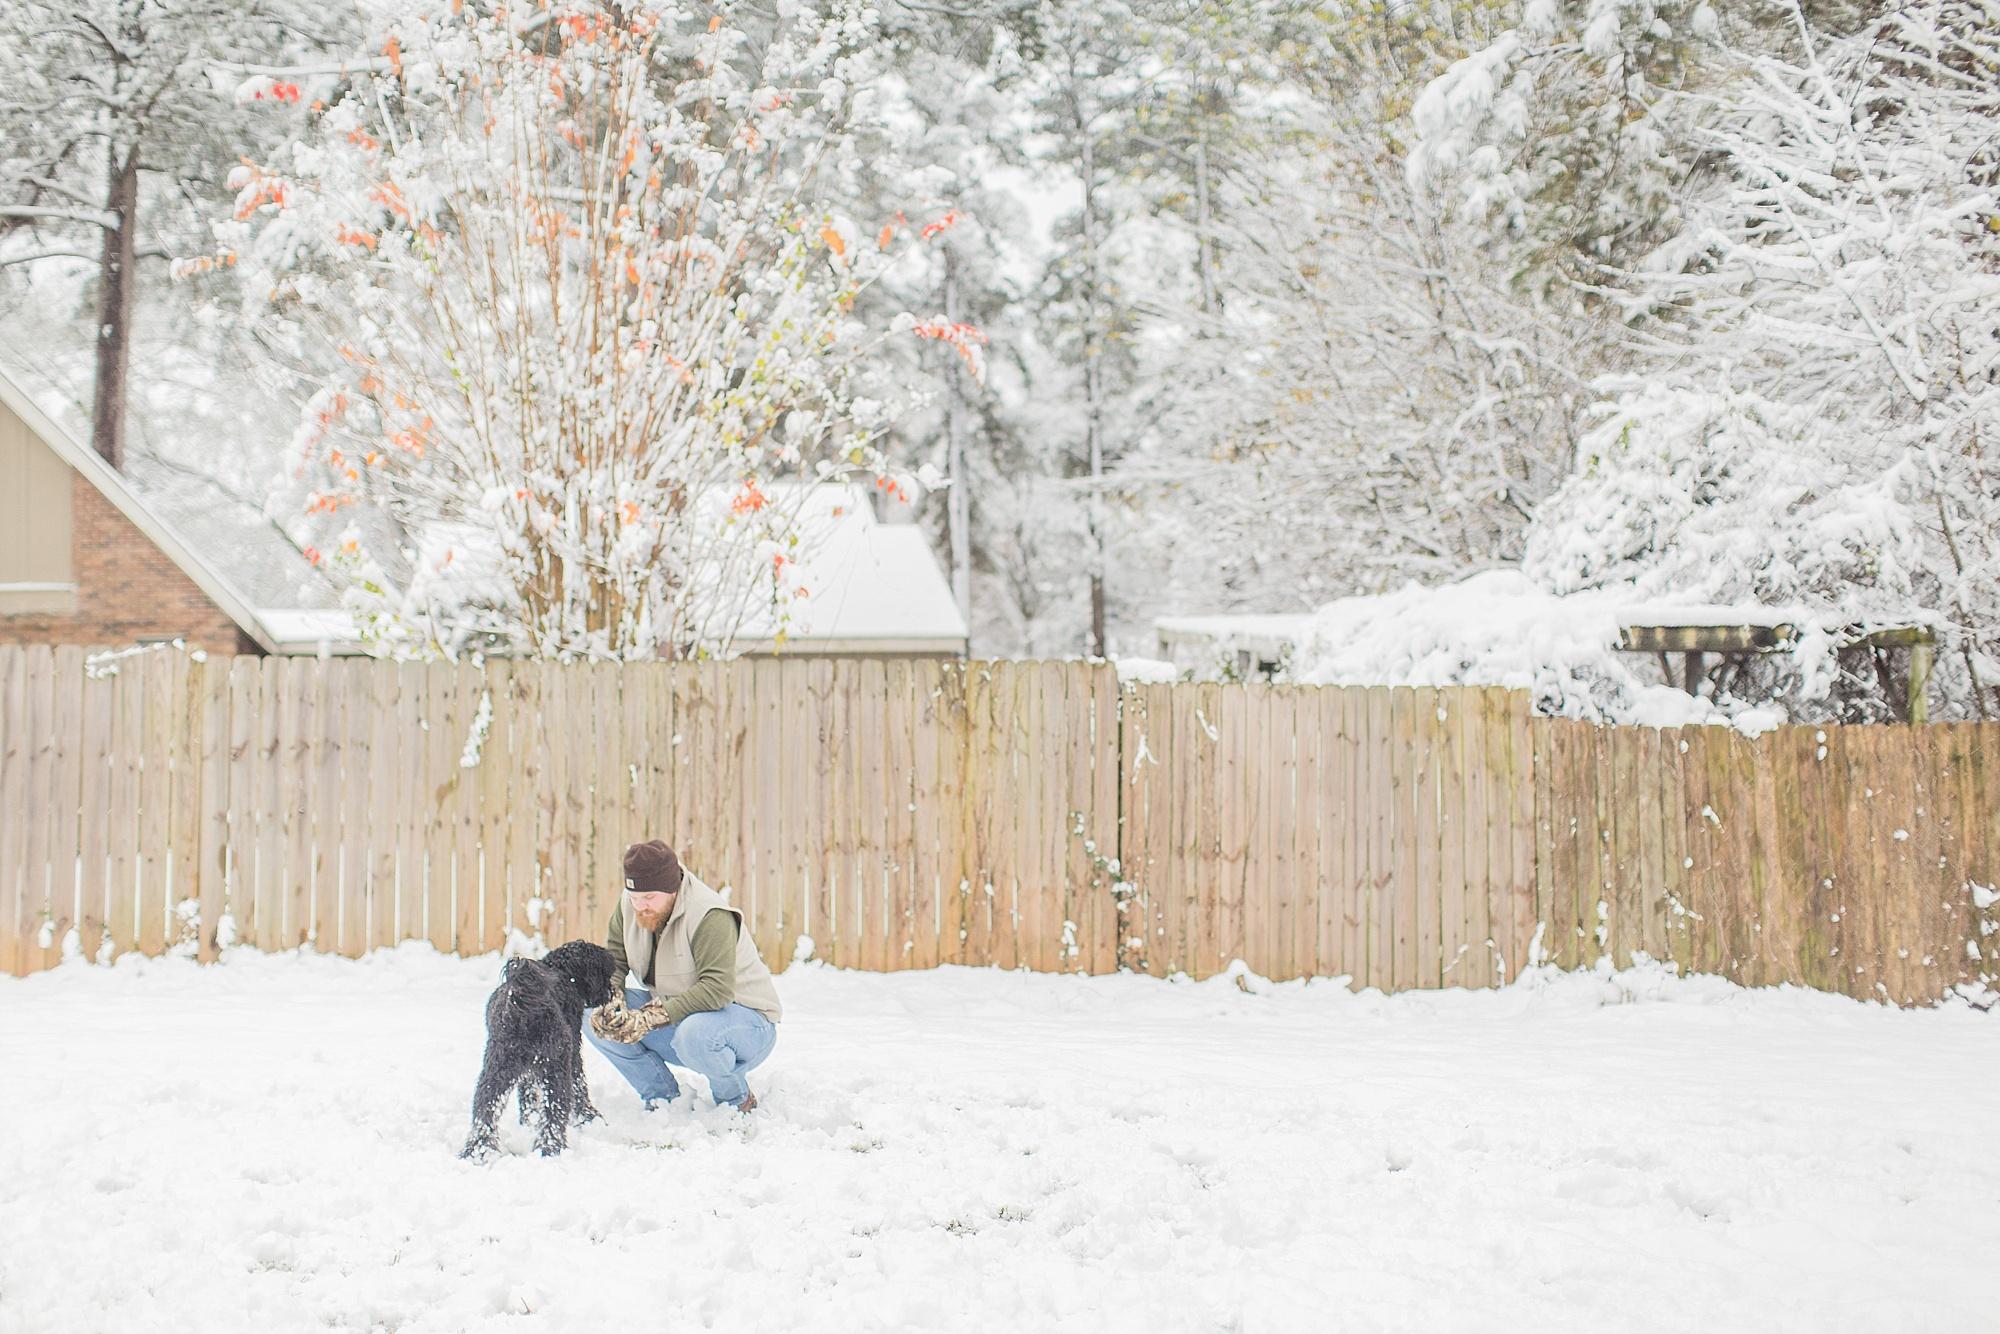 mississippi-snow-day_0015.jpg